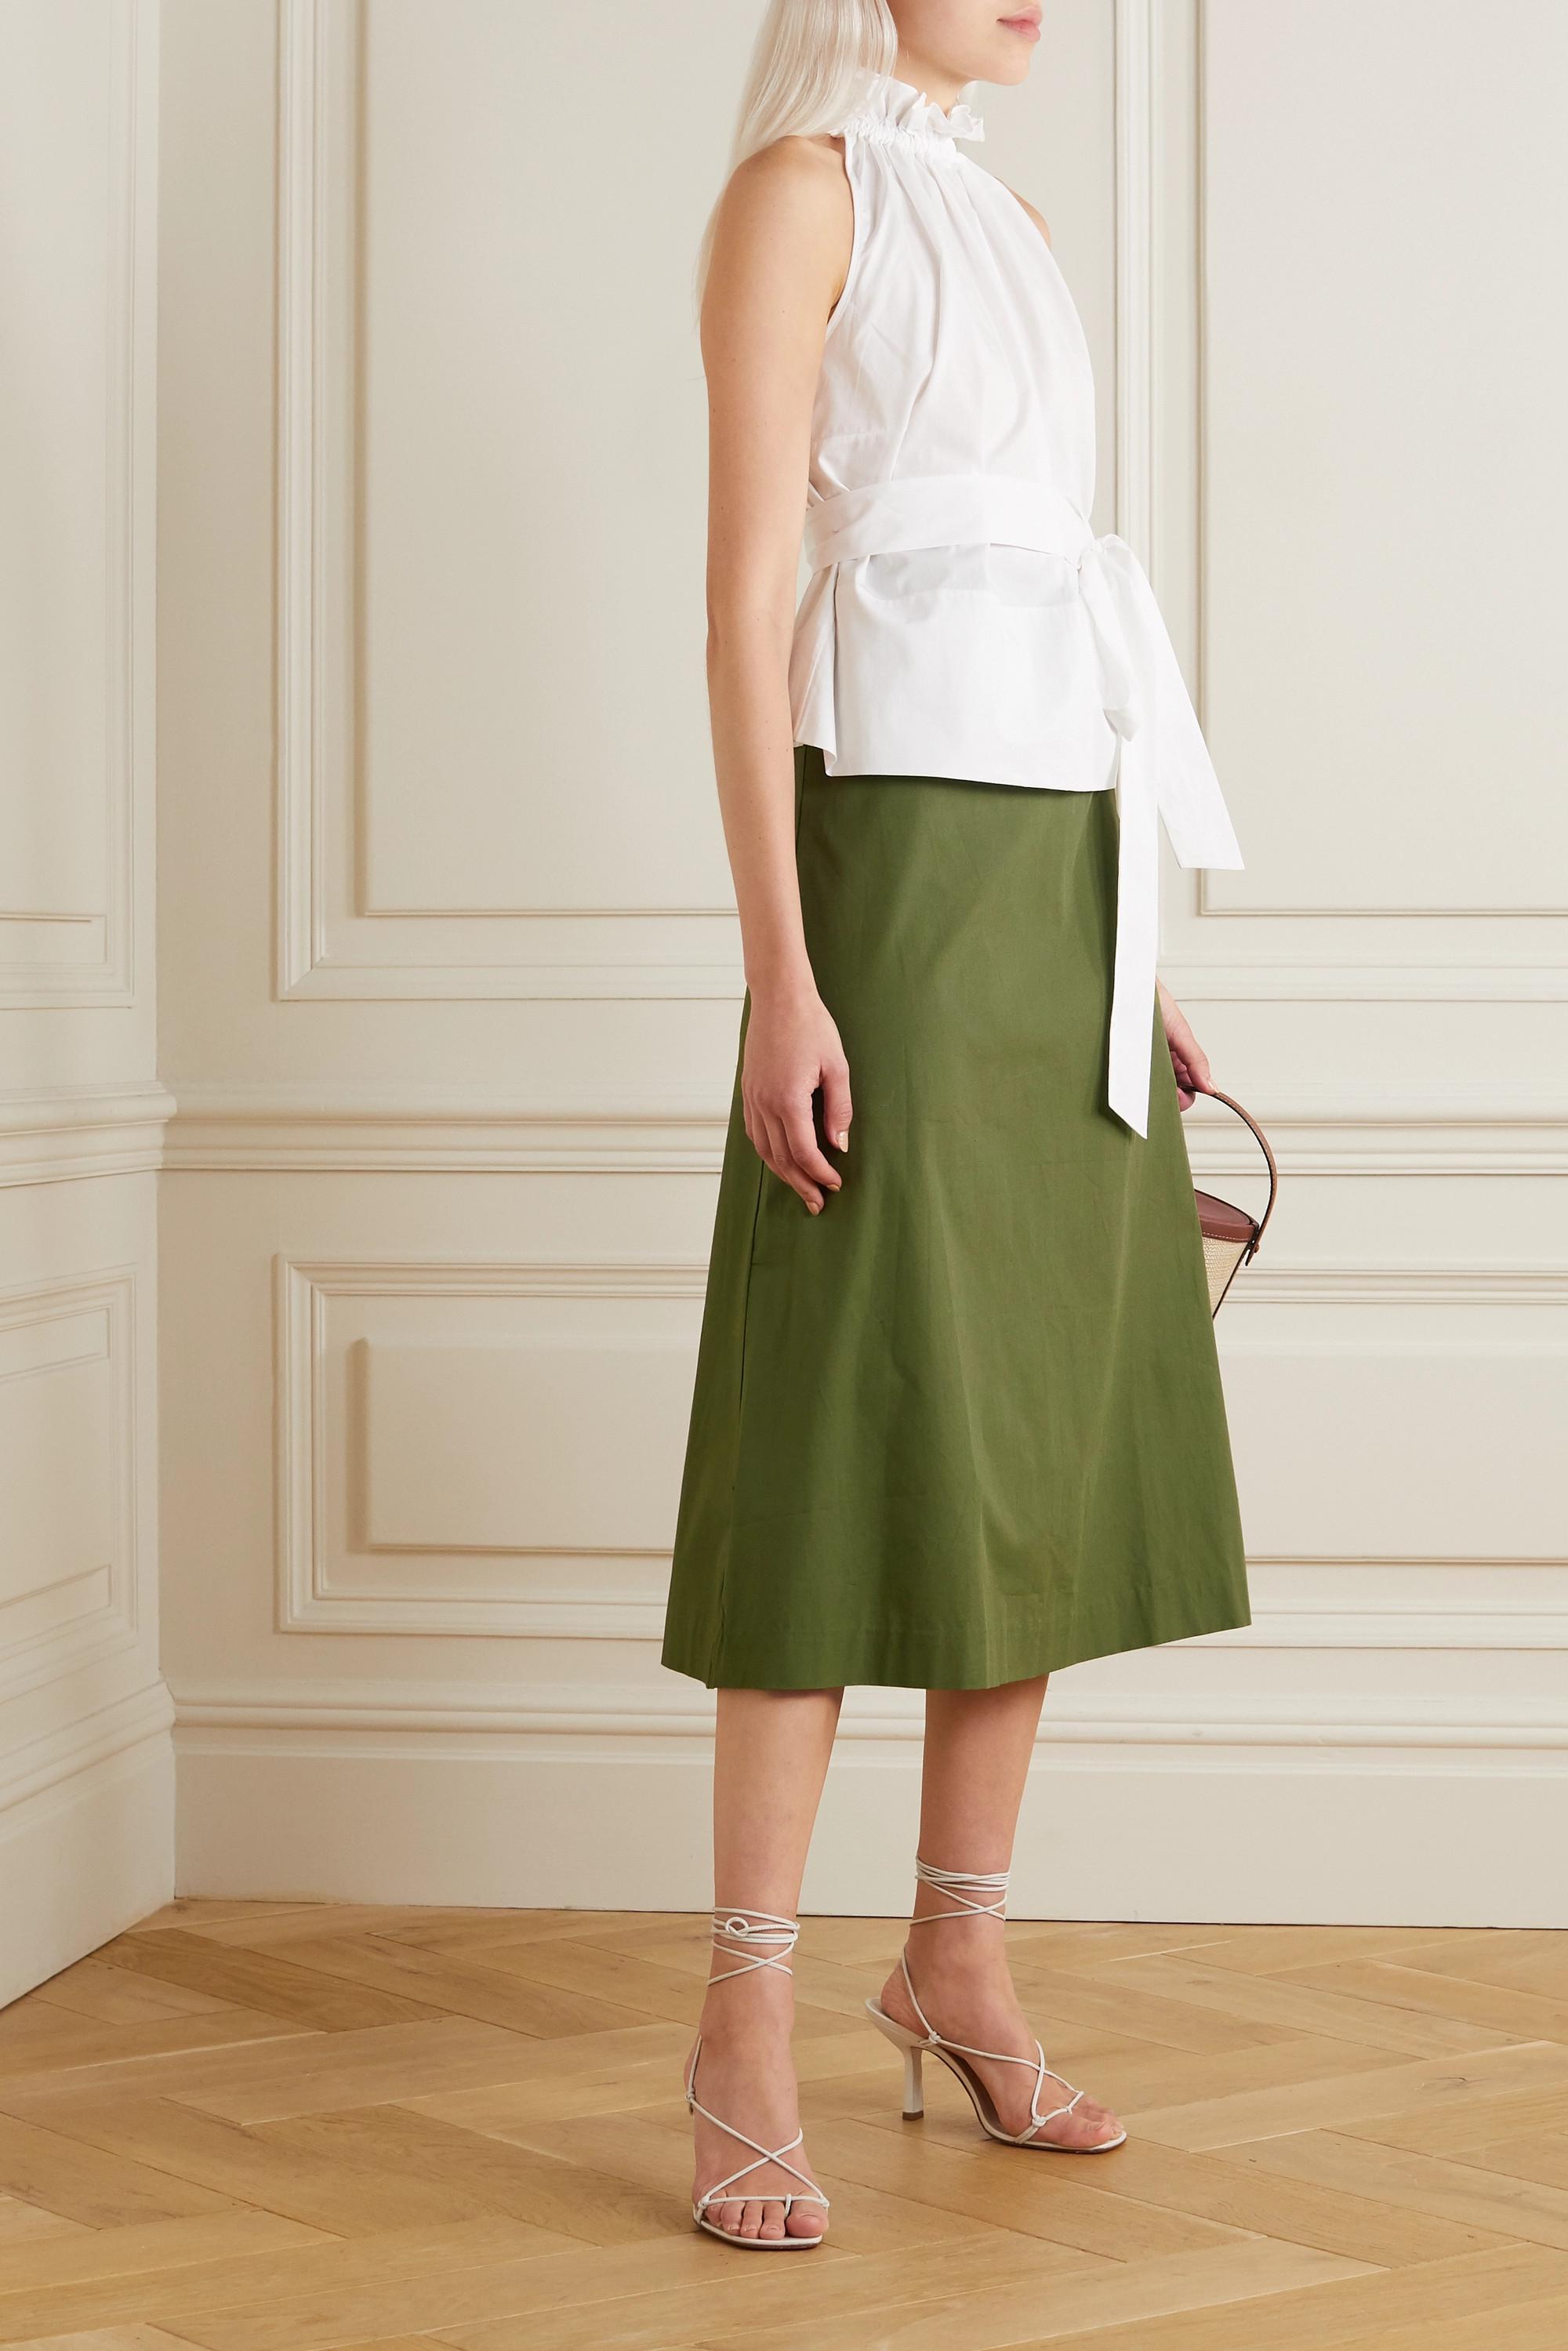 ARoss Girl x Soler Alma cotton midi skirt